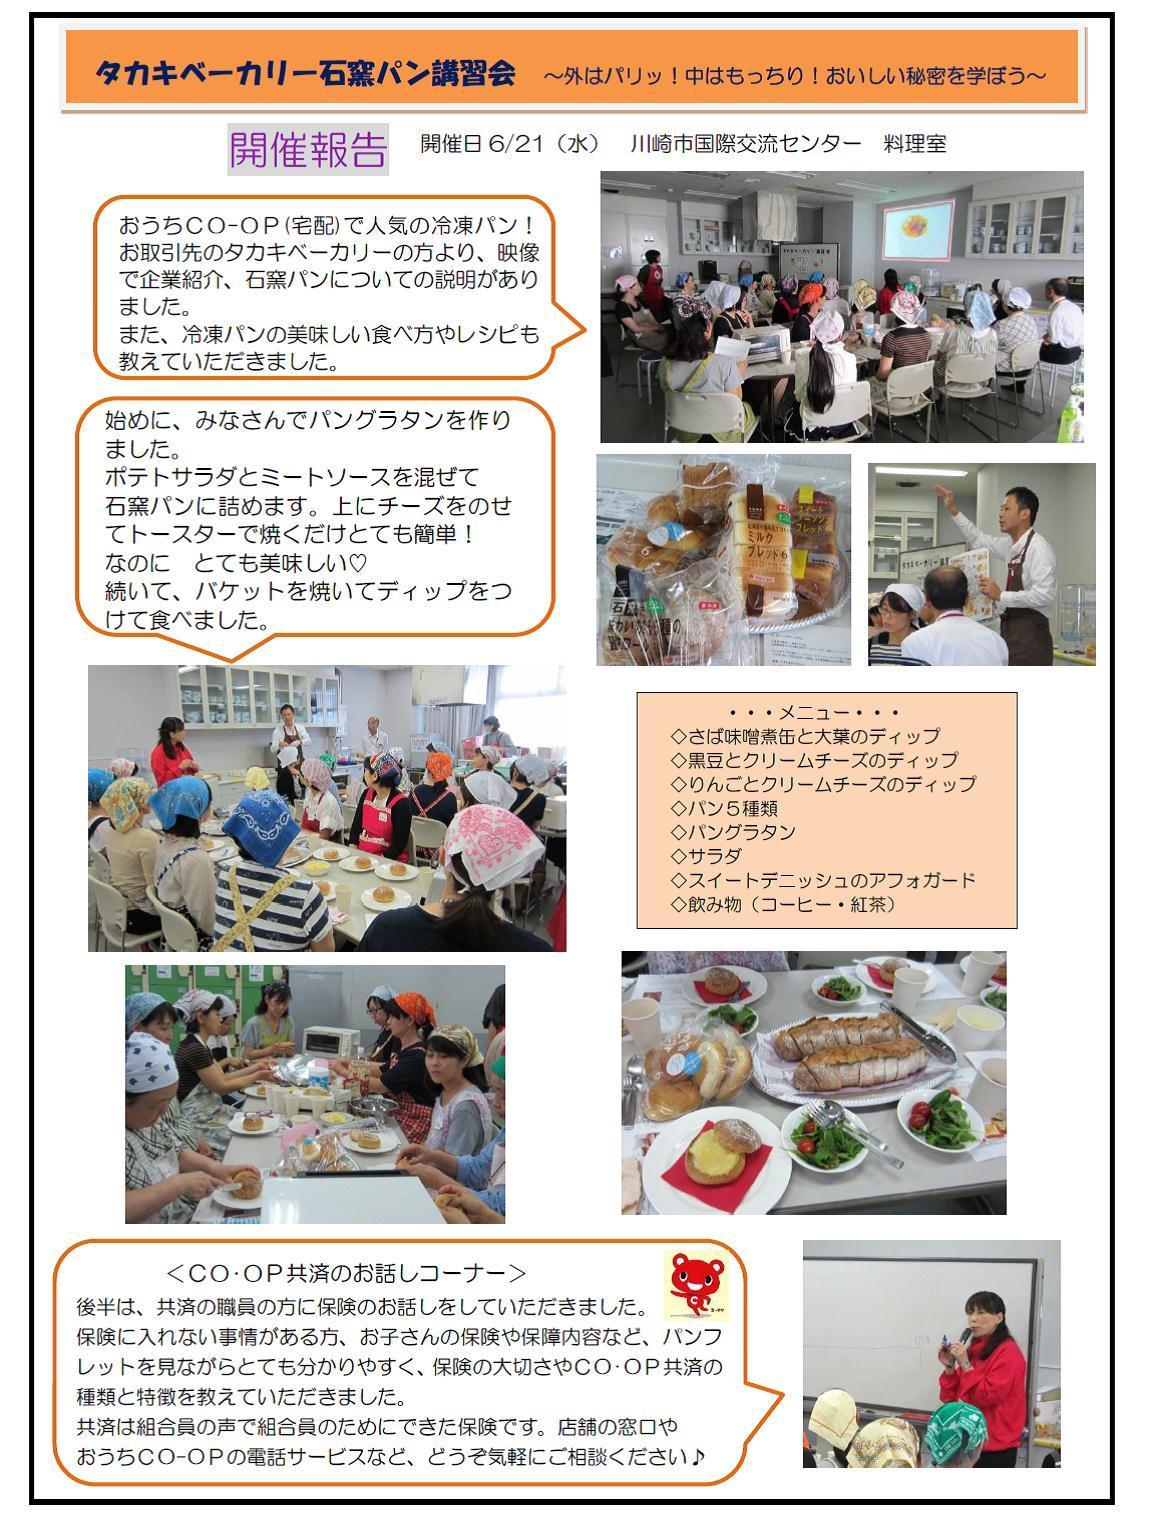 http://kanagawa.ucoop.or.jp/hiroba/areanews/files/18kawasaki1takaki.jpg